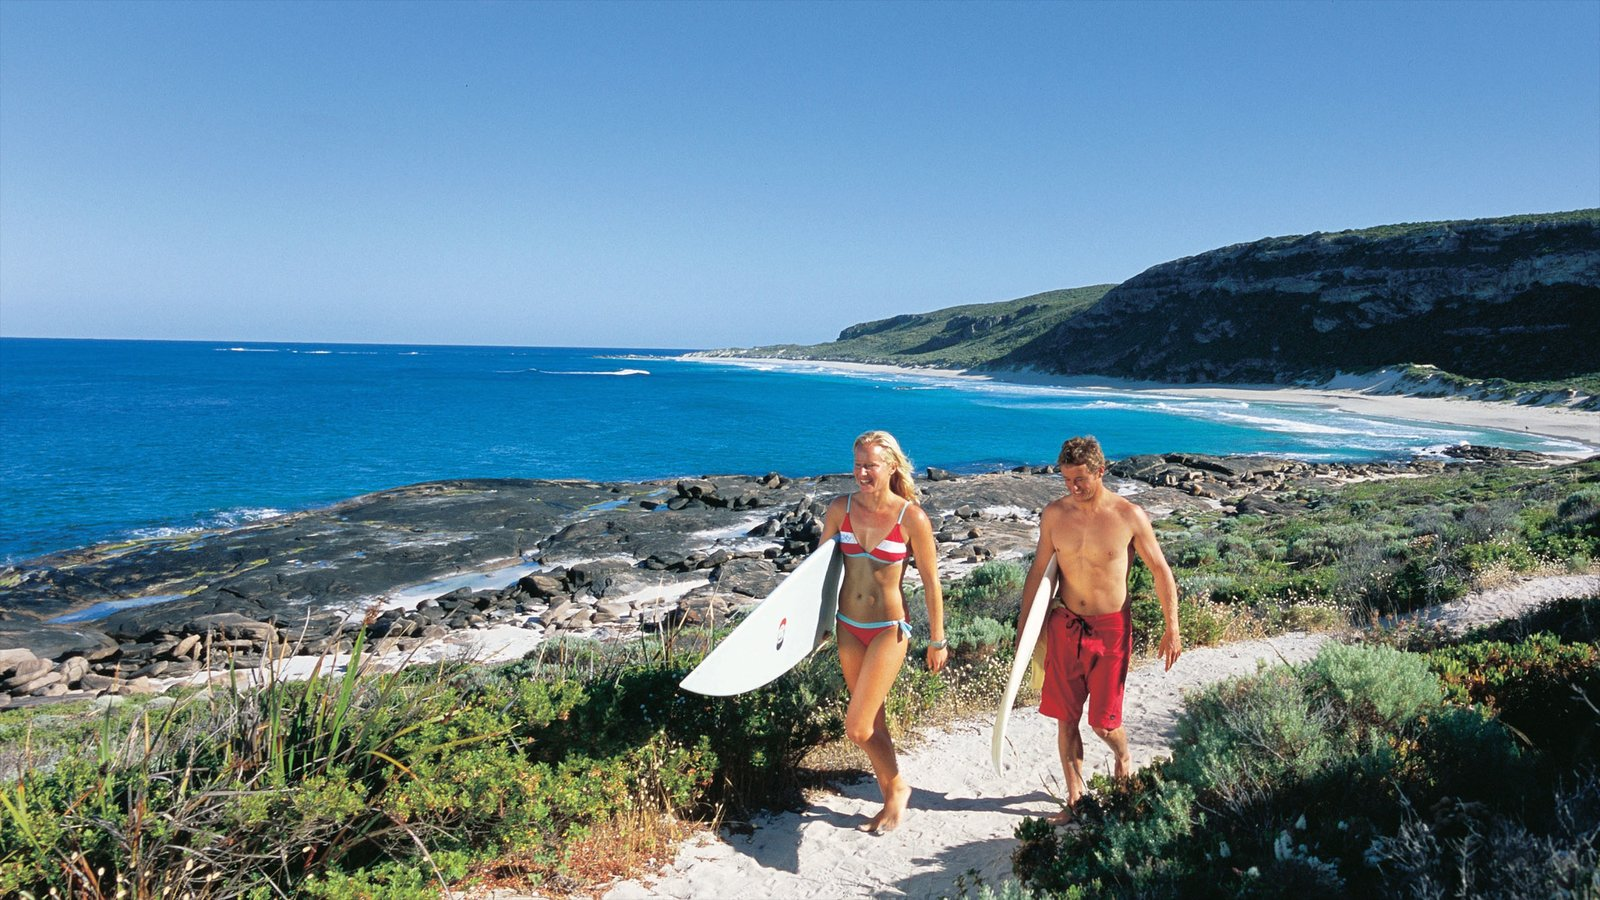 Margaret River Wine Region which includes surfing, rocky coastline and landscape views